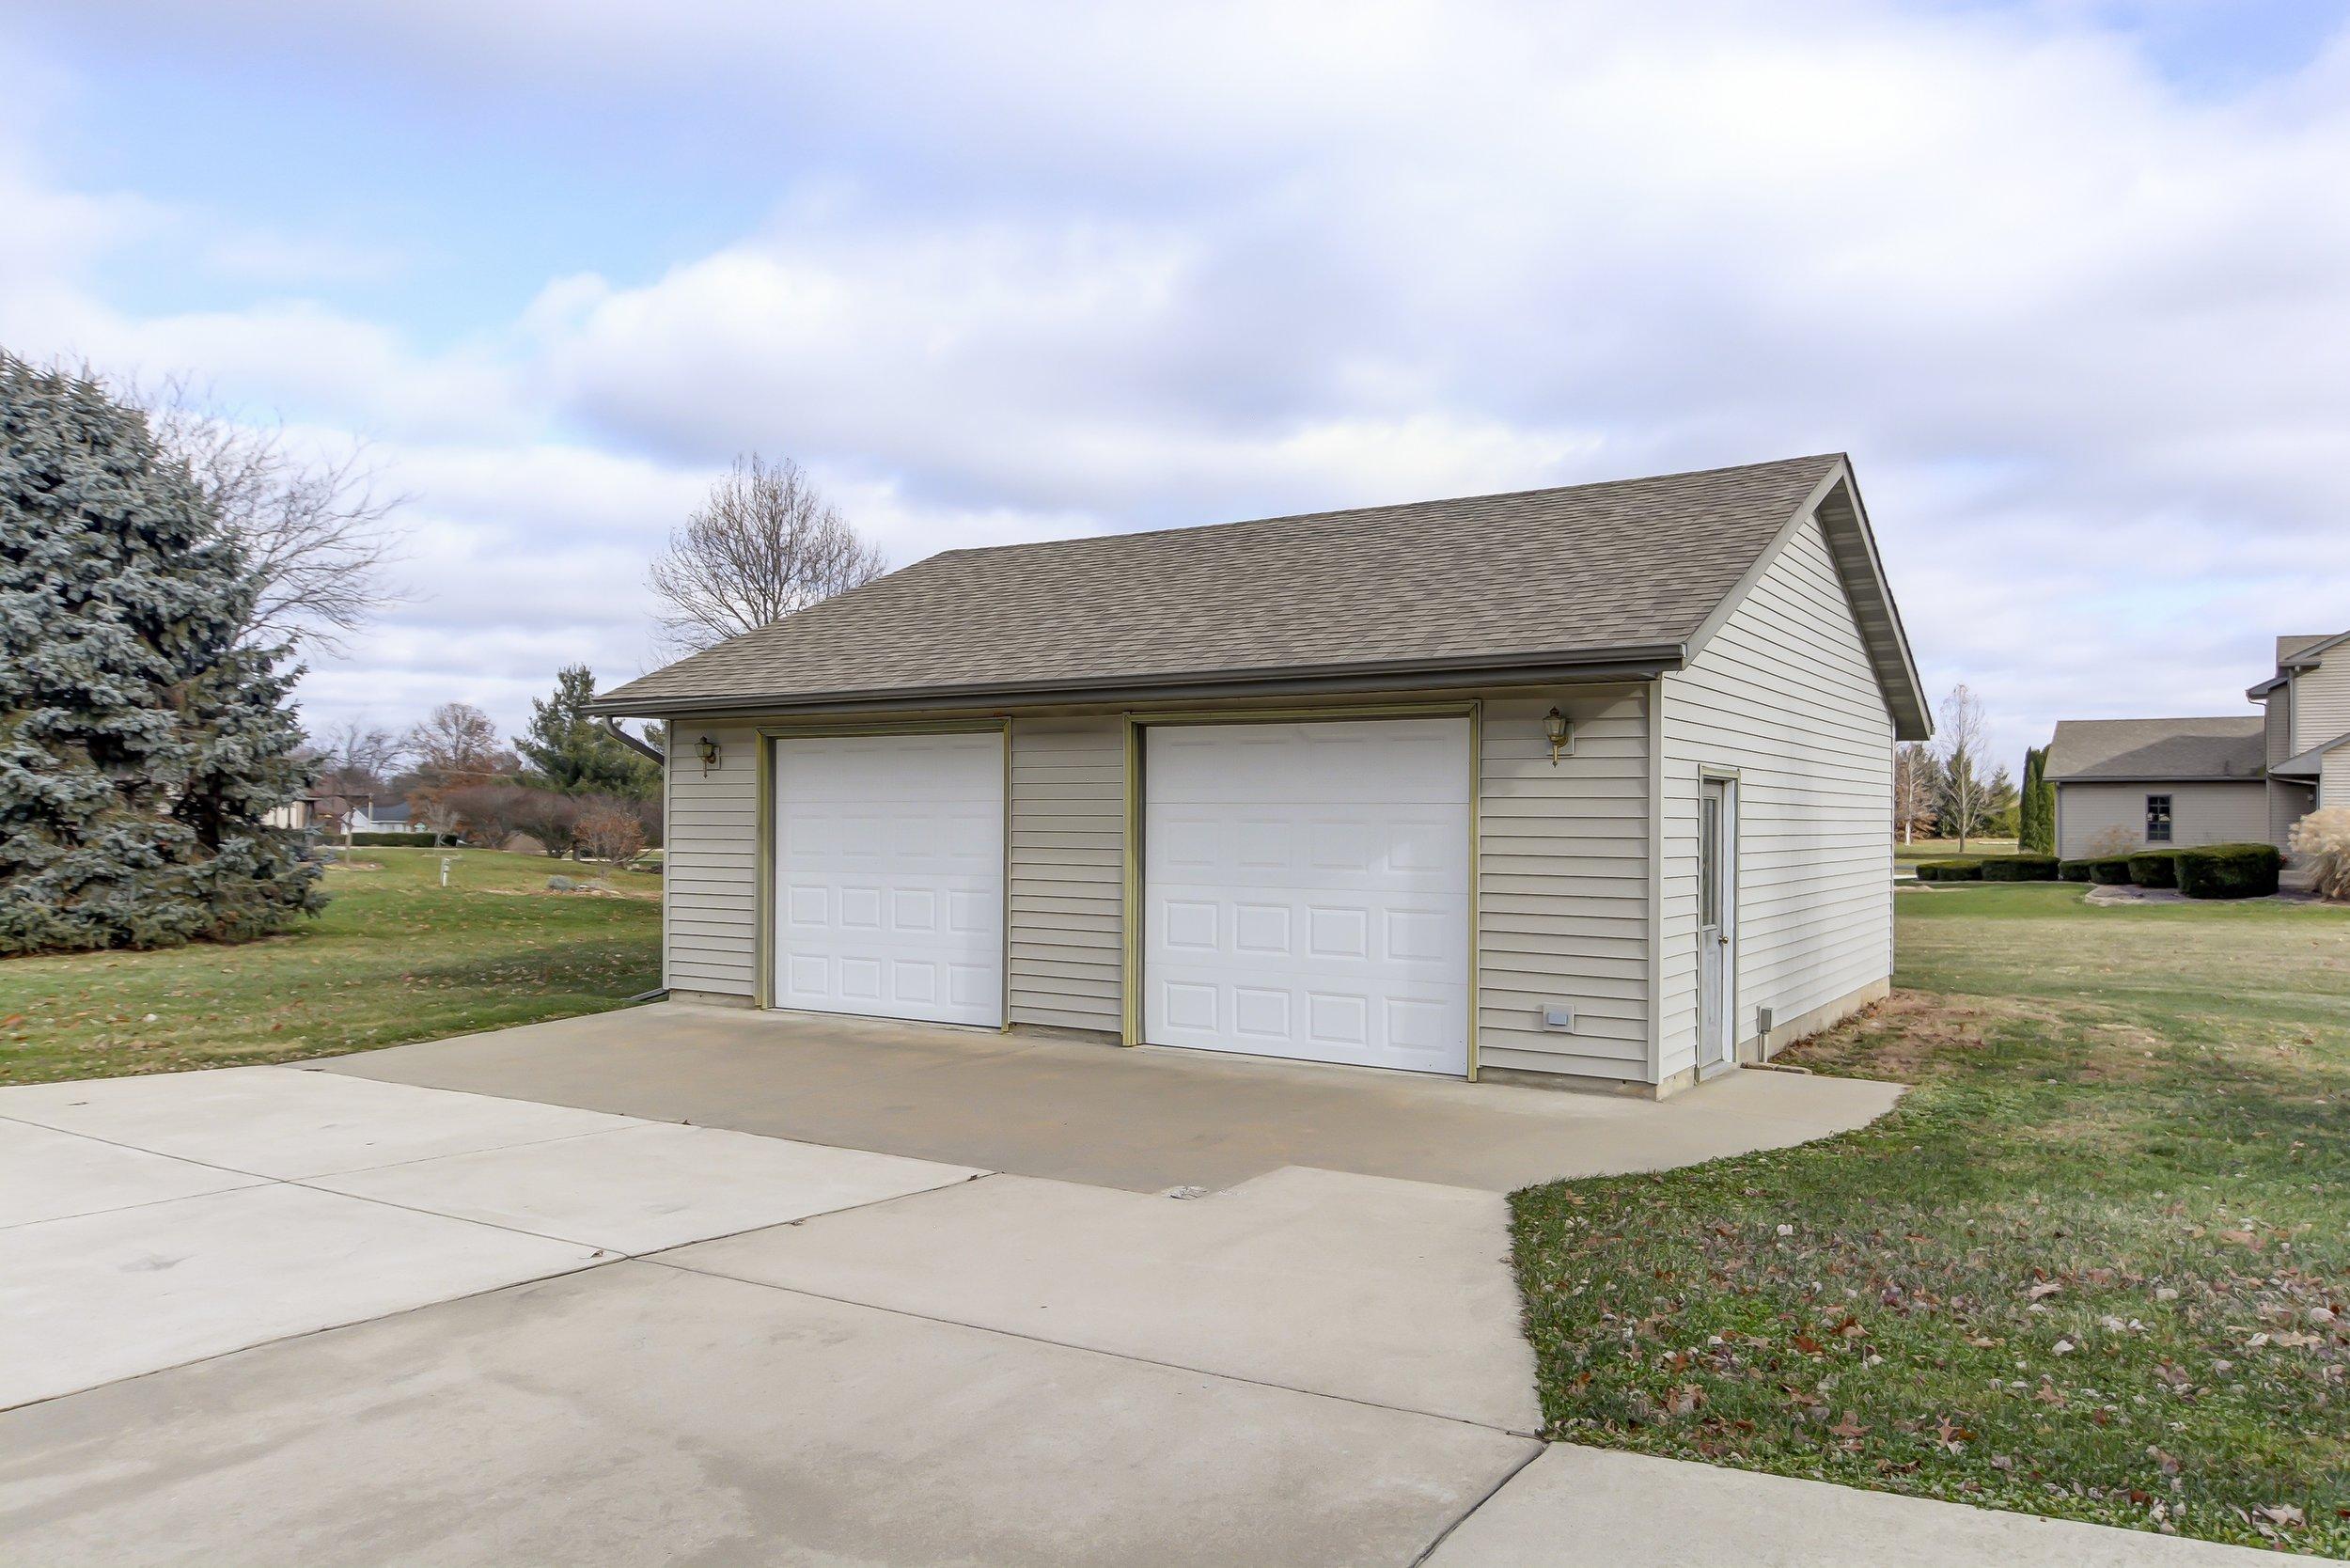 Detached 2.5 car garage